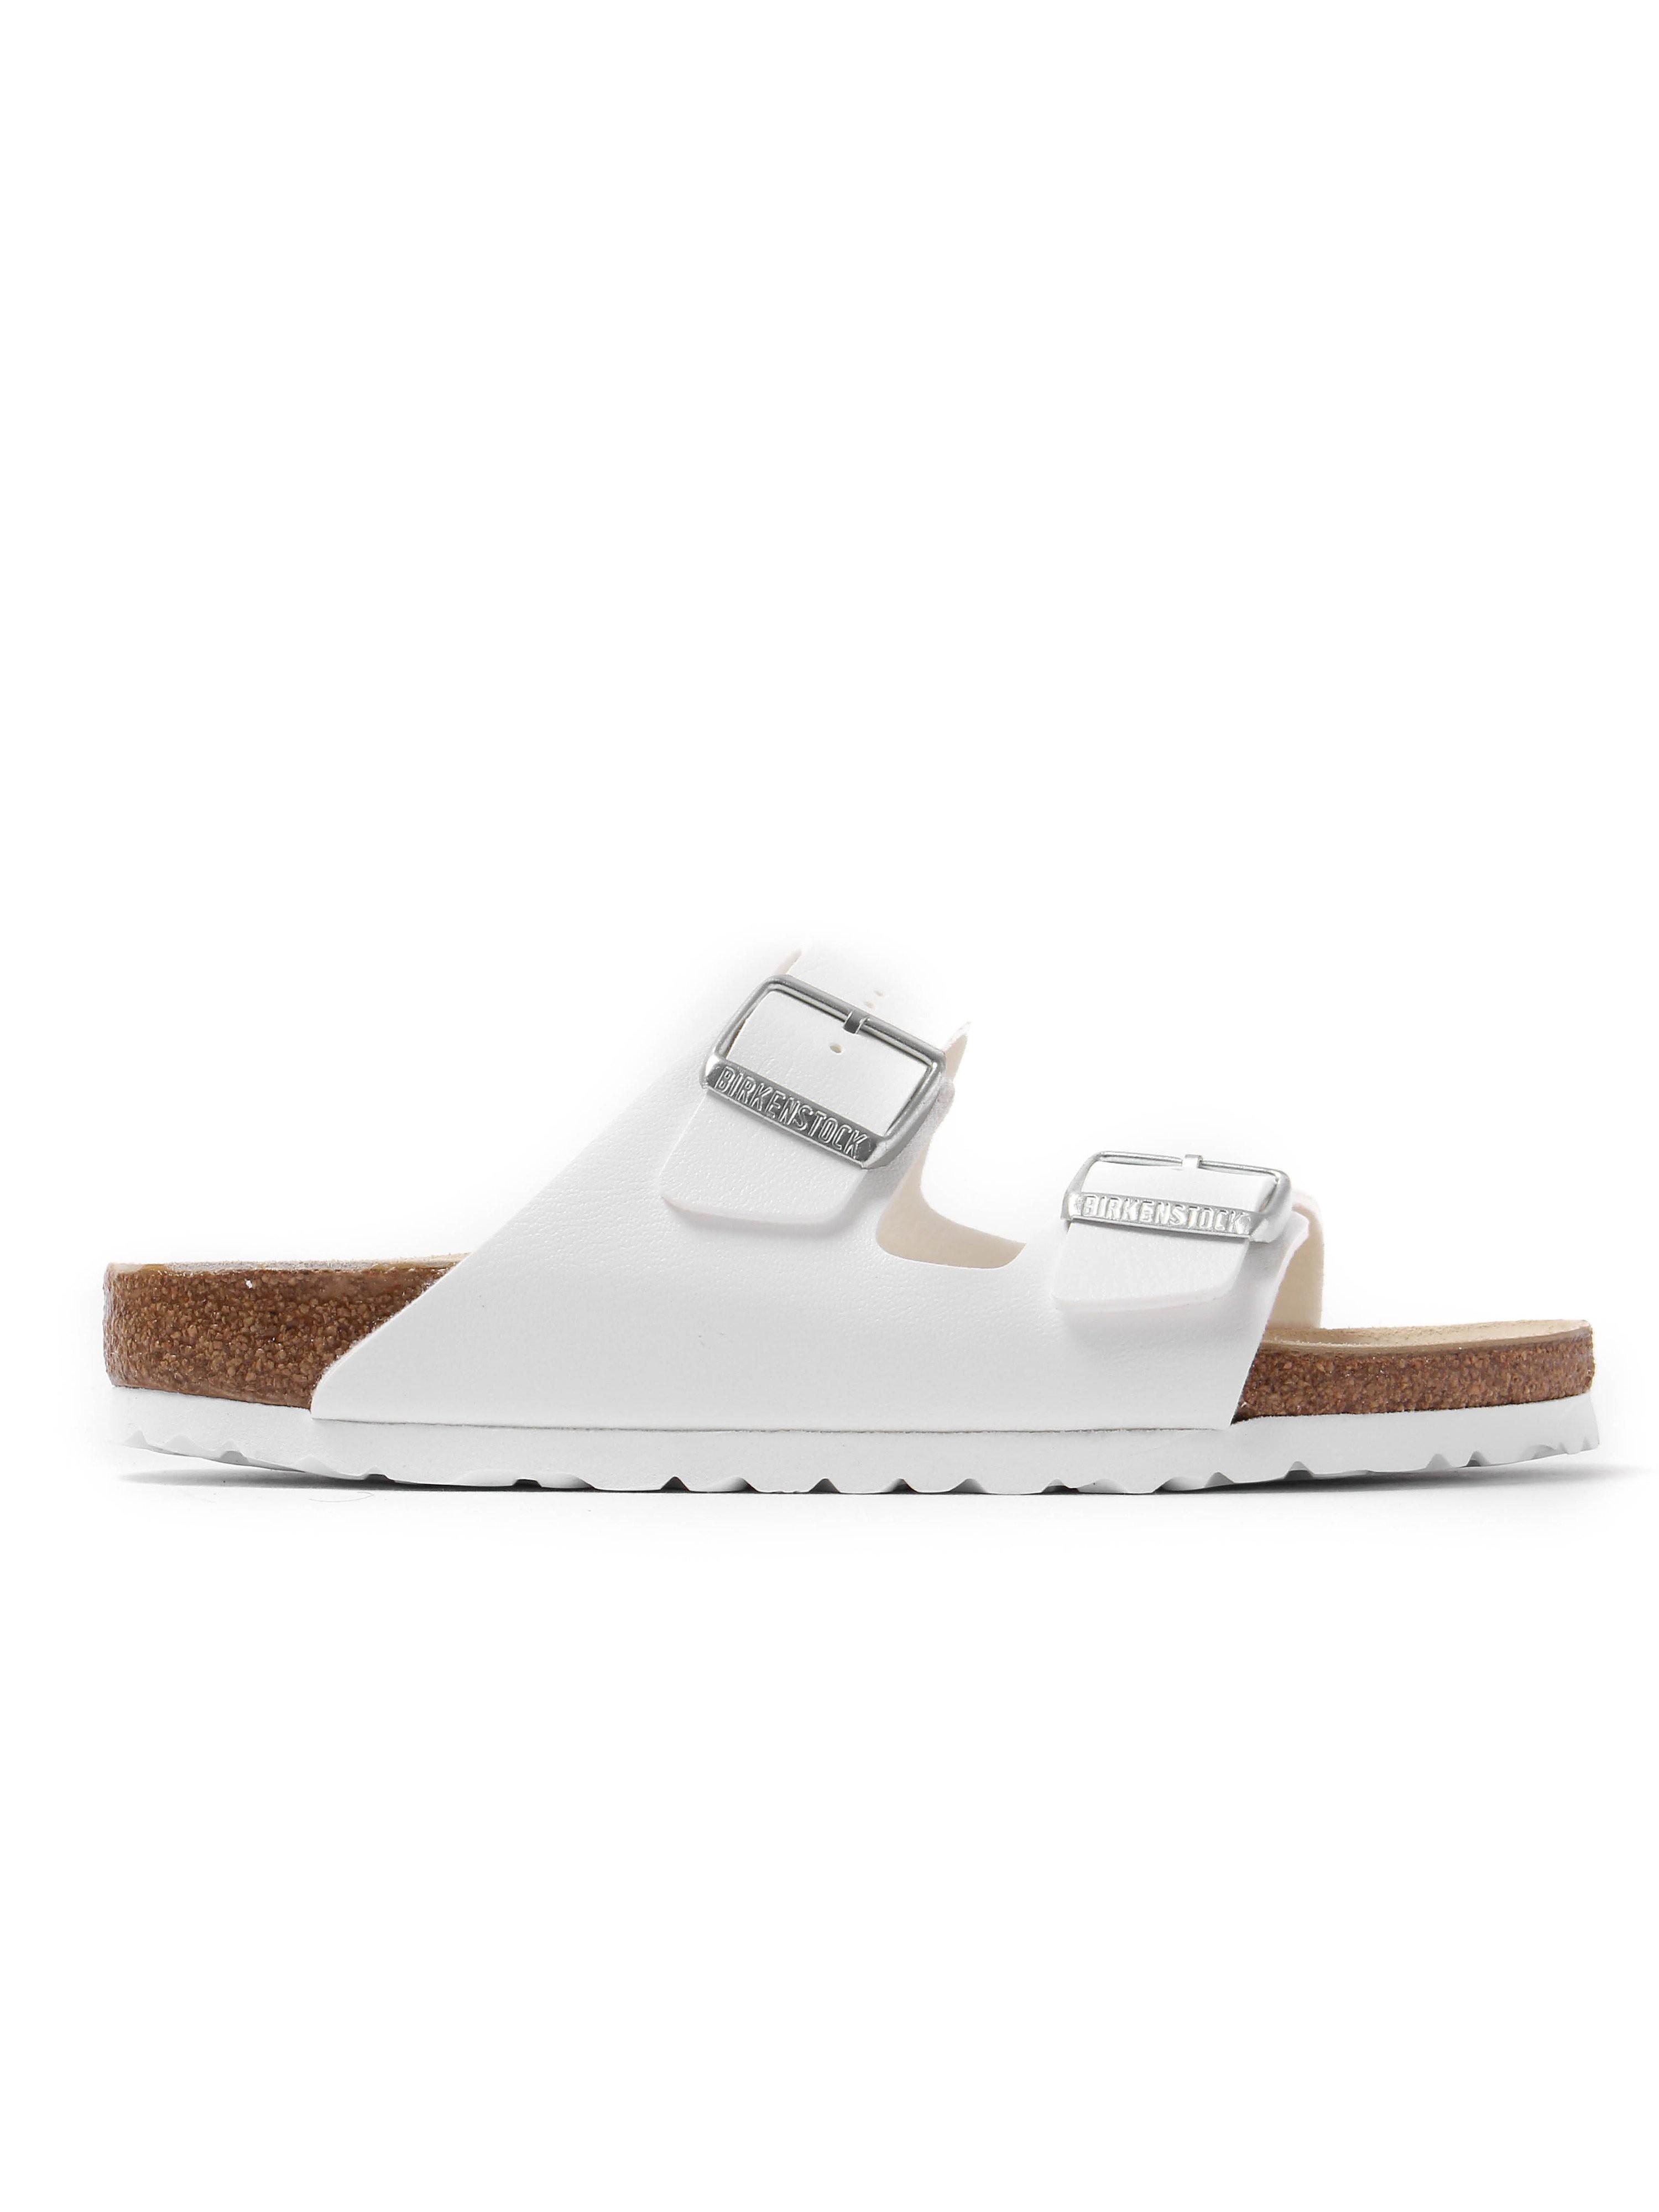 Birkenstock Women's Arizona Double Strap Narrow Fit Sandals - White